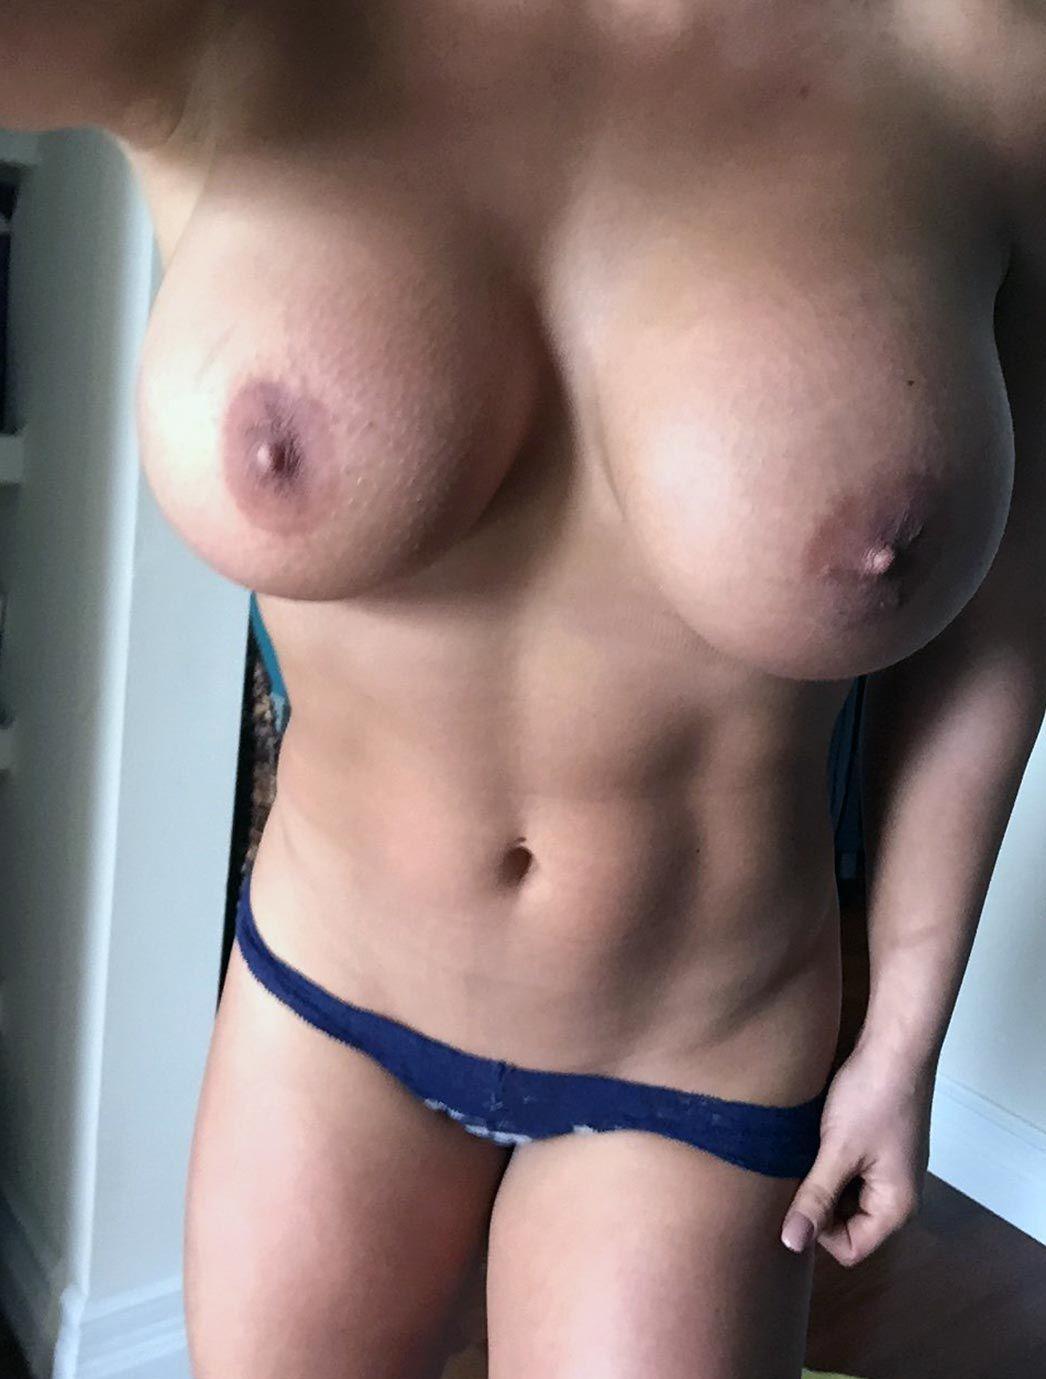 Celeste Bonin Nude Leaked The Fappening & Sexy 0209